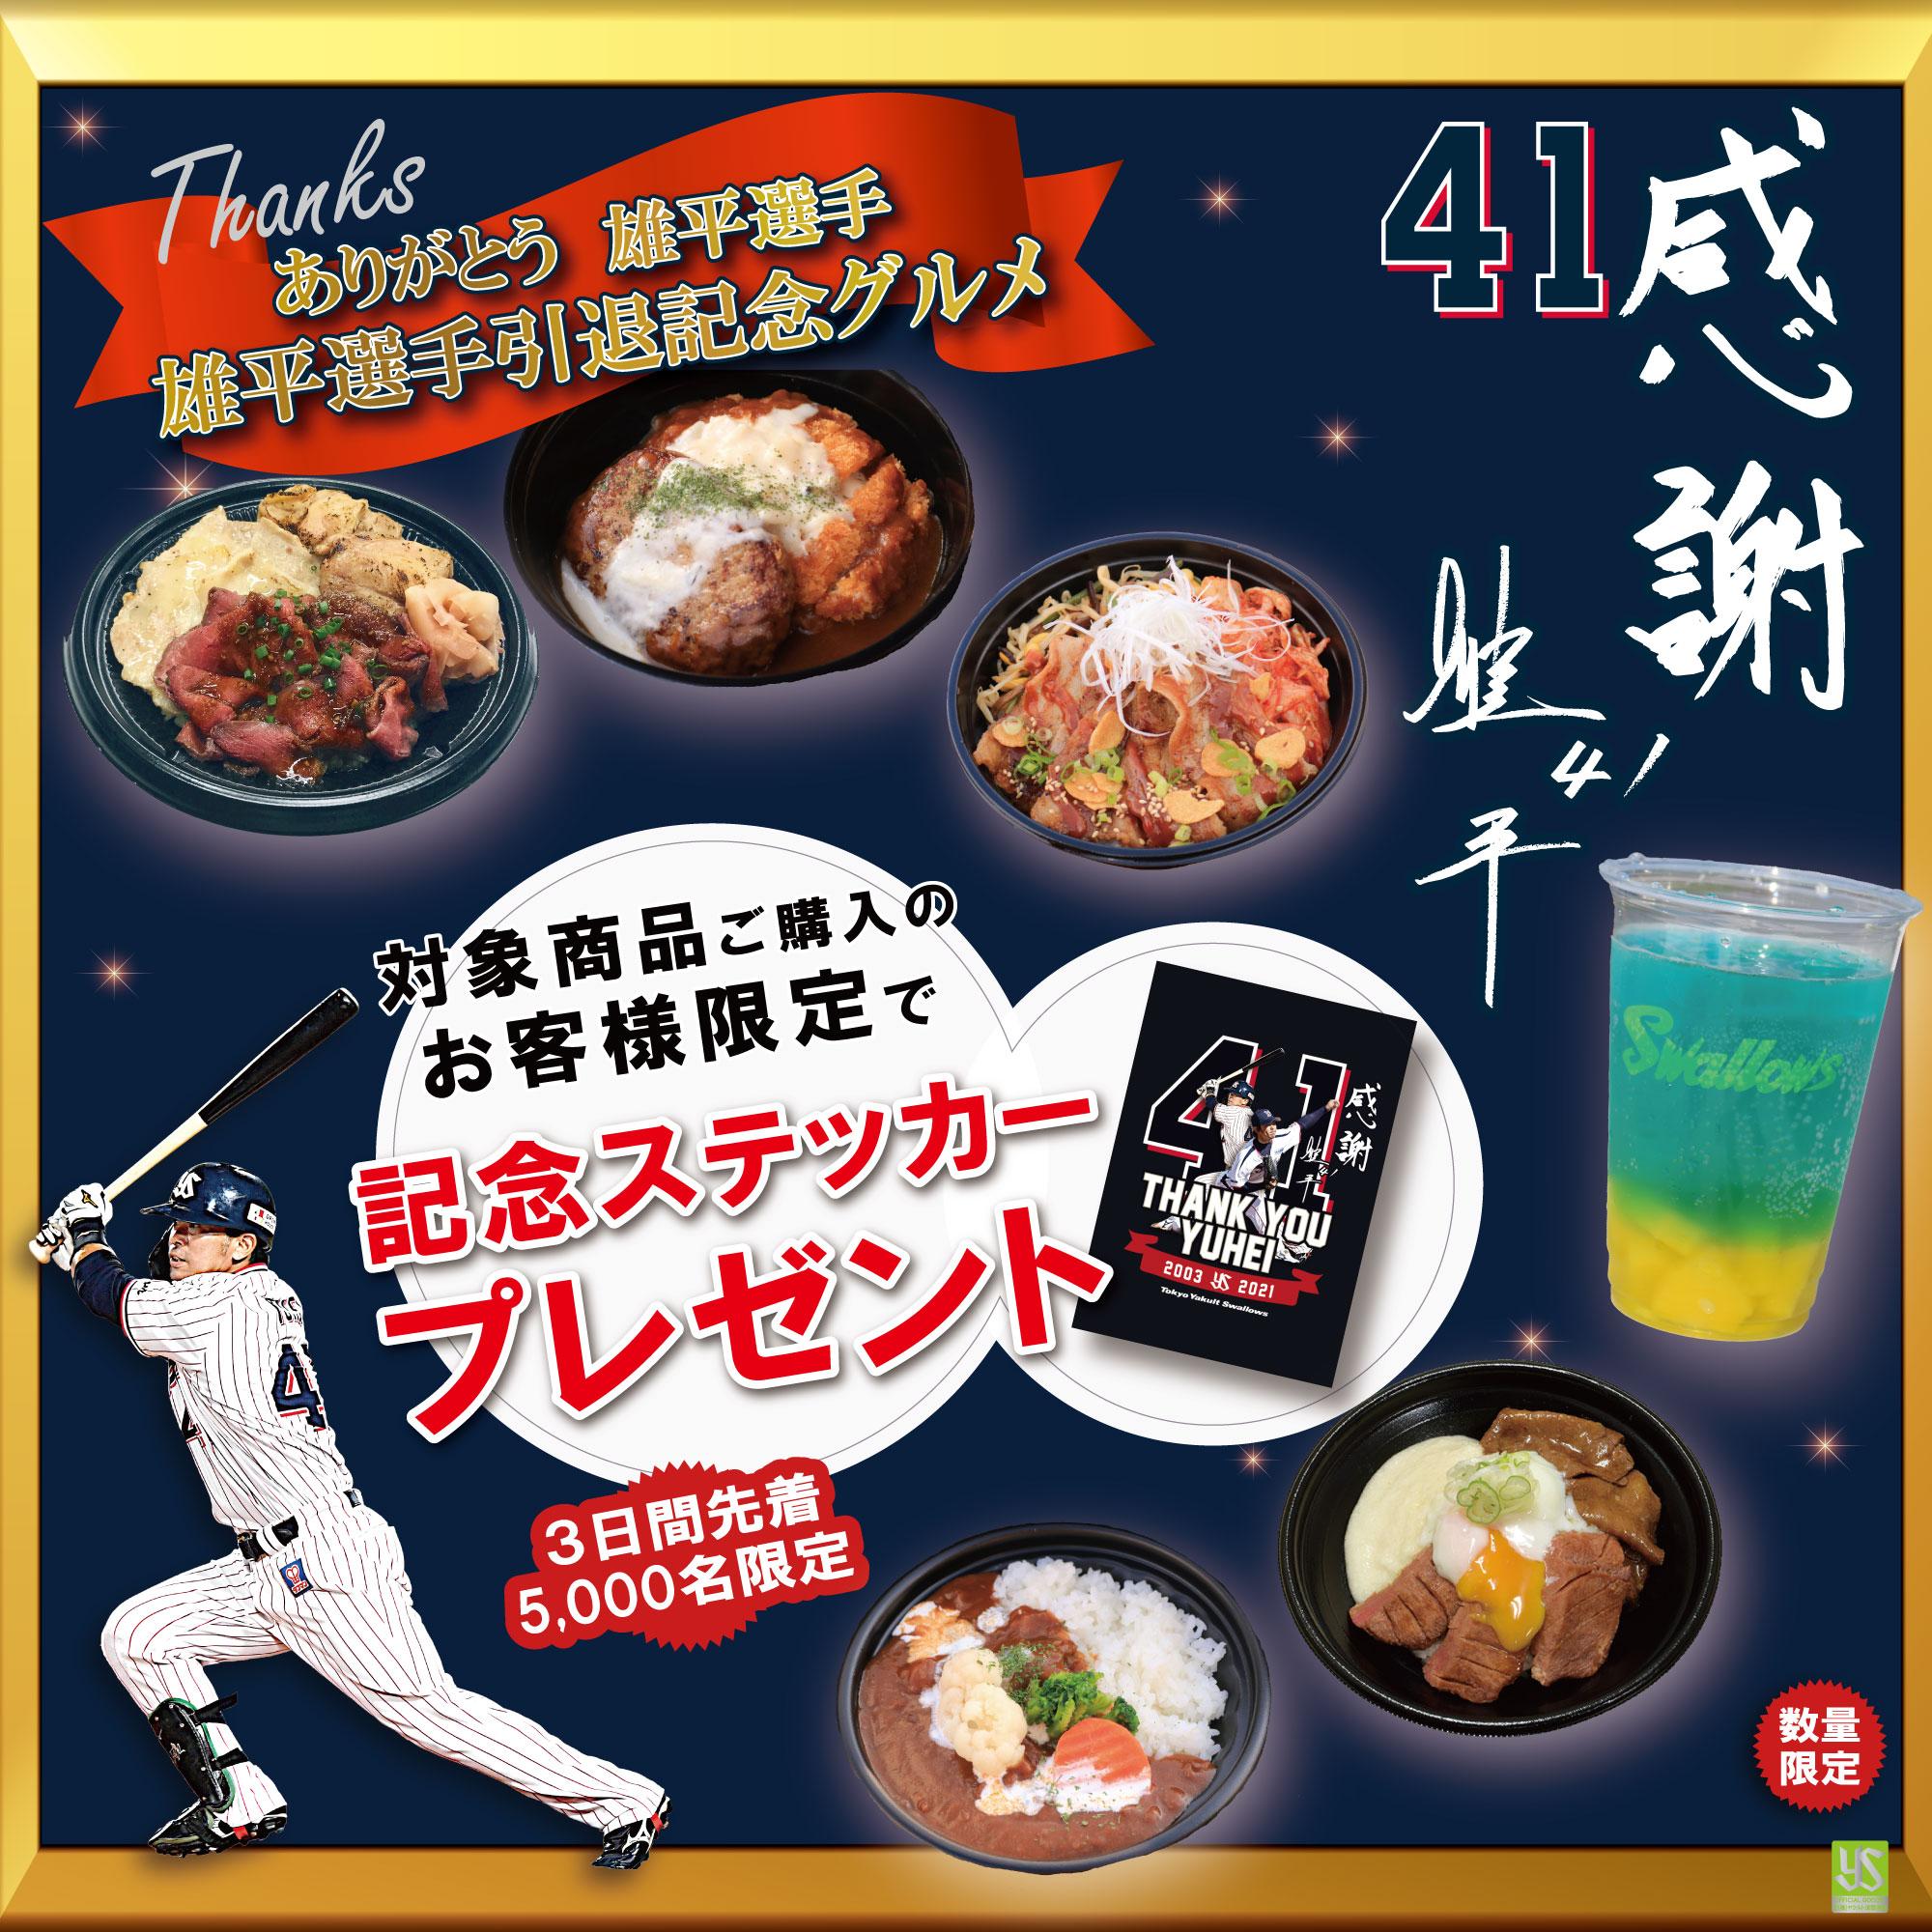 雄平選手引退記念グルメ(商品情報追加)10月22日更新